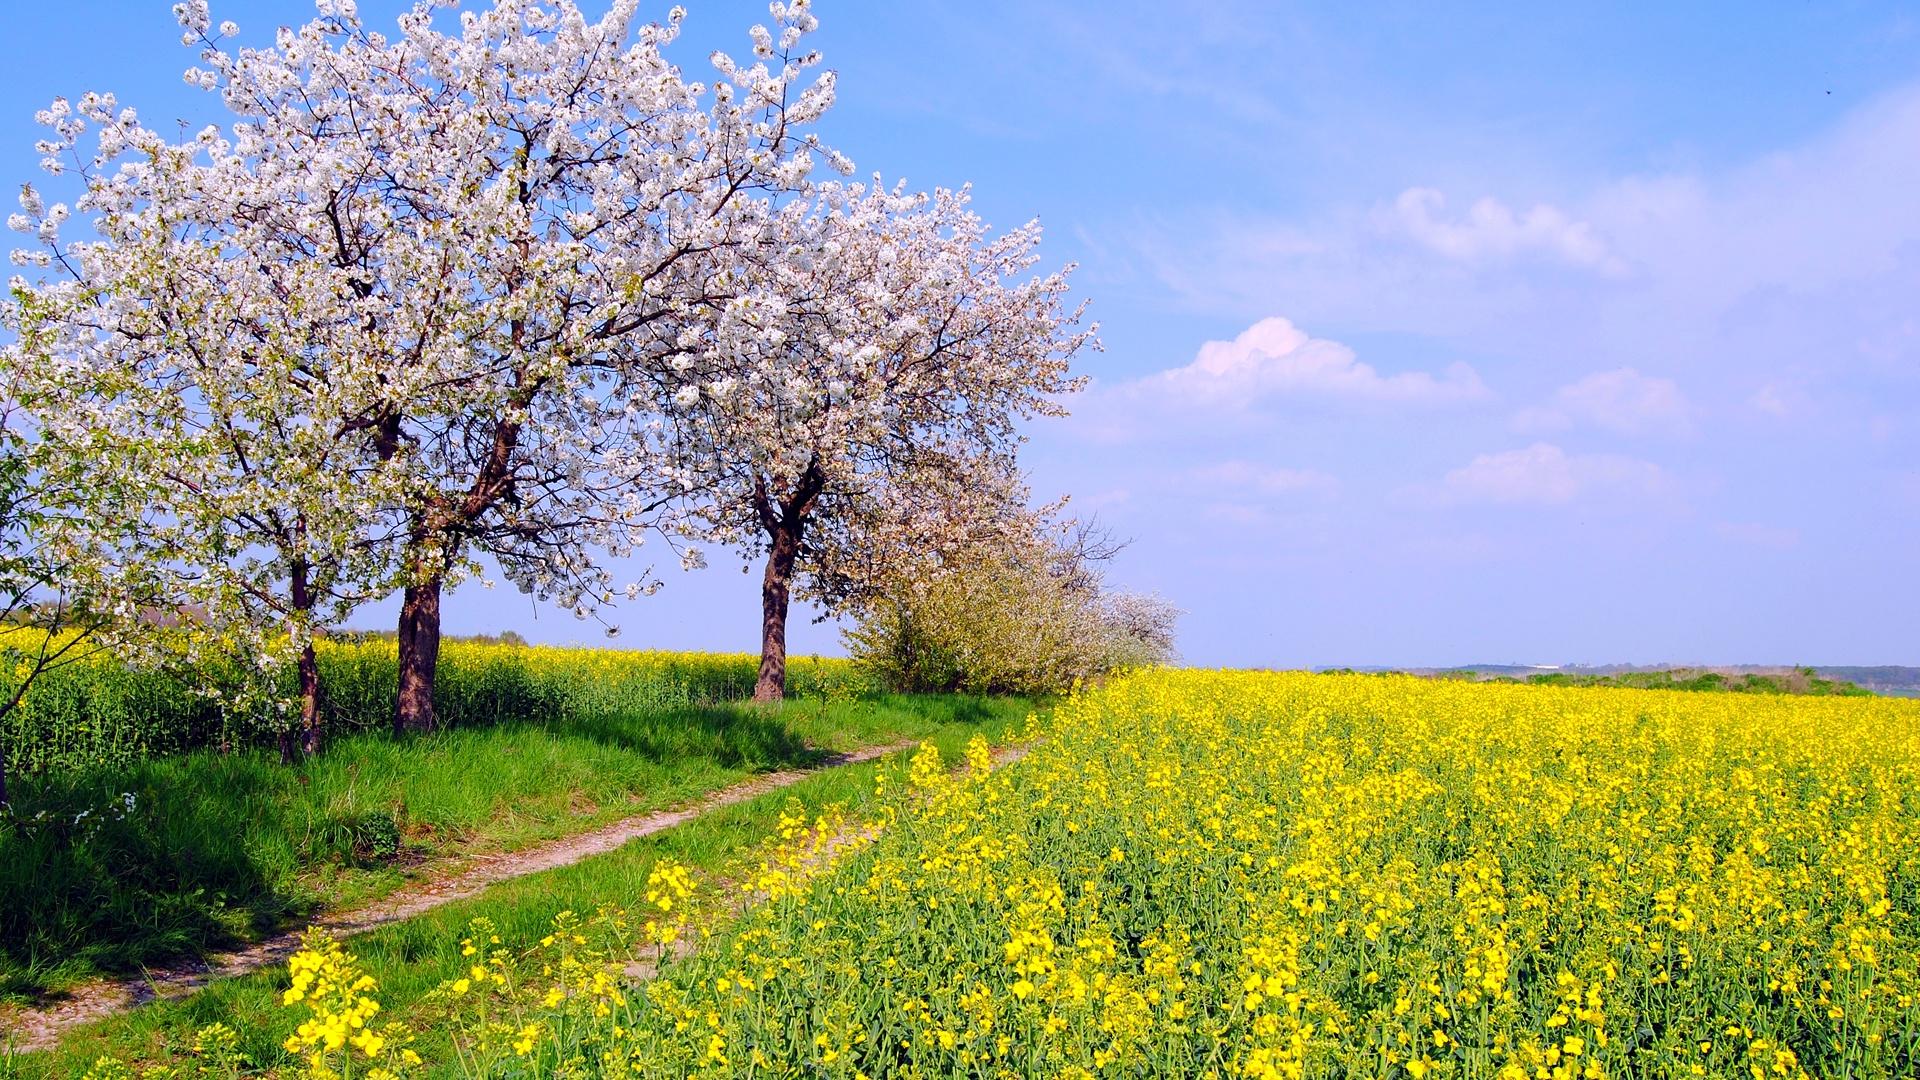 Free spring desktop wallpapers nexus wallpapersafari for Immagini sfondo desktop primavera